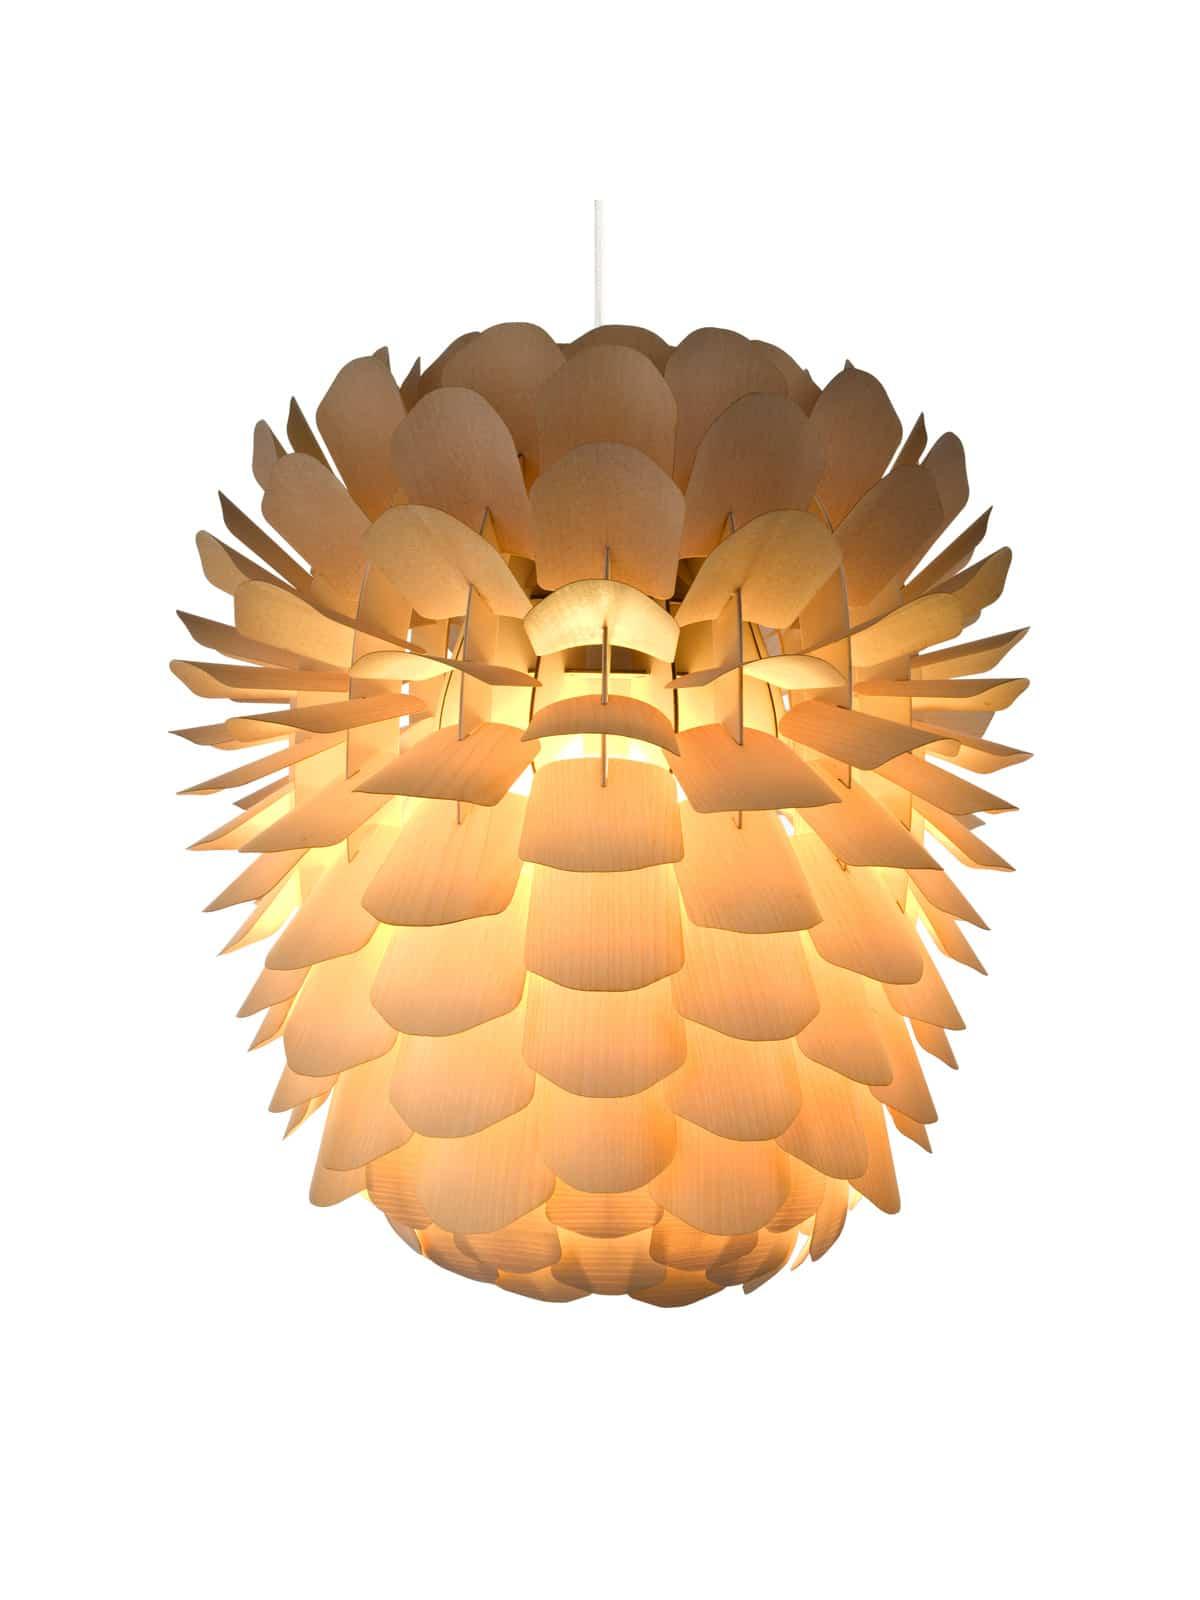 Lampe Design Pinienzapfen Pinienzapfen Gewinner Lampe Design Gewinner PZiuOXk